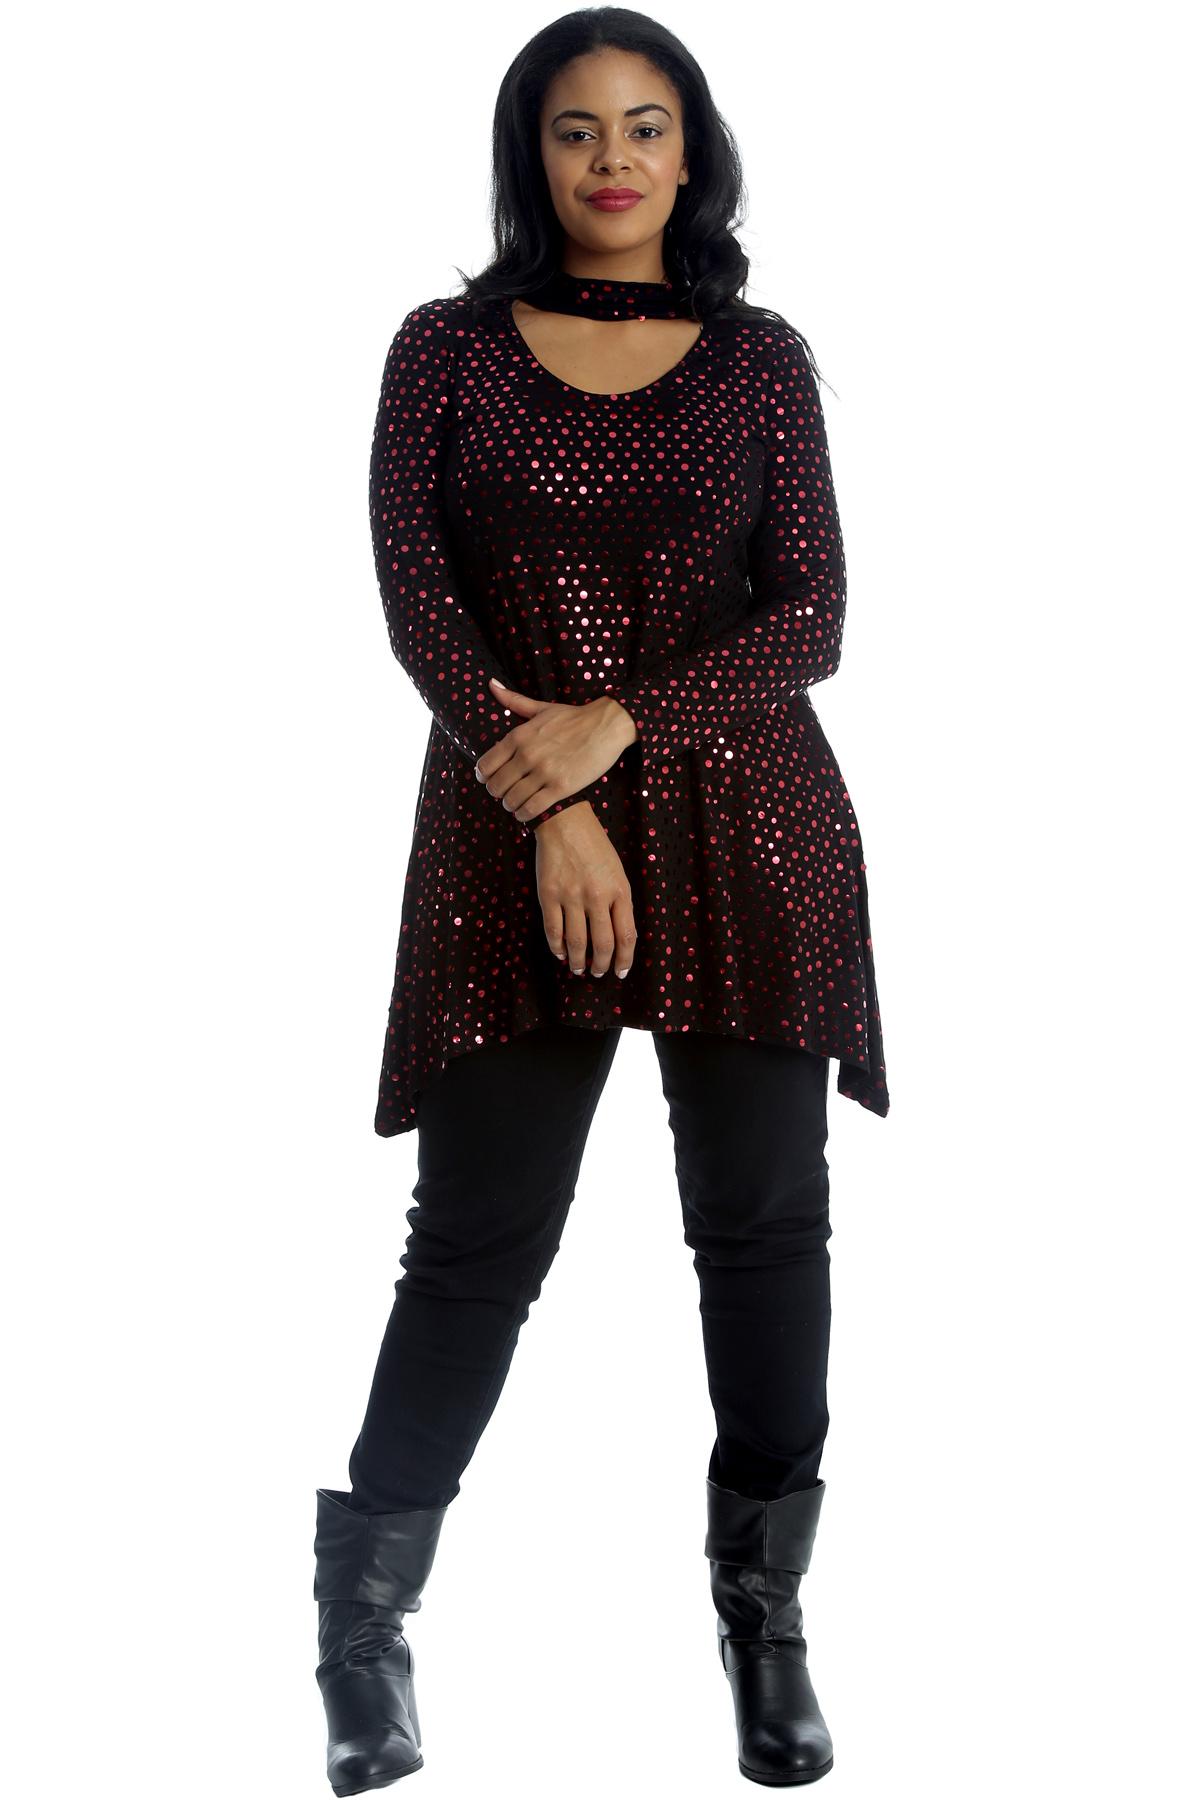 New Womens Top Plus Size Swing Style Polka Dot Foil Ladies Tunic Choker Neck